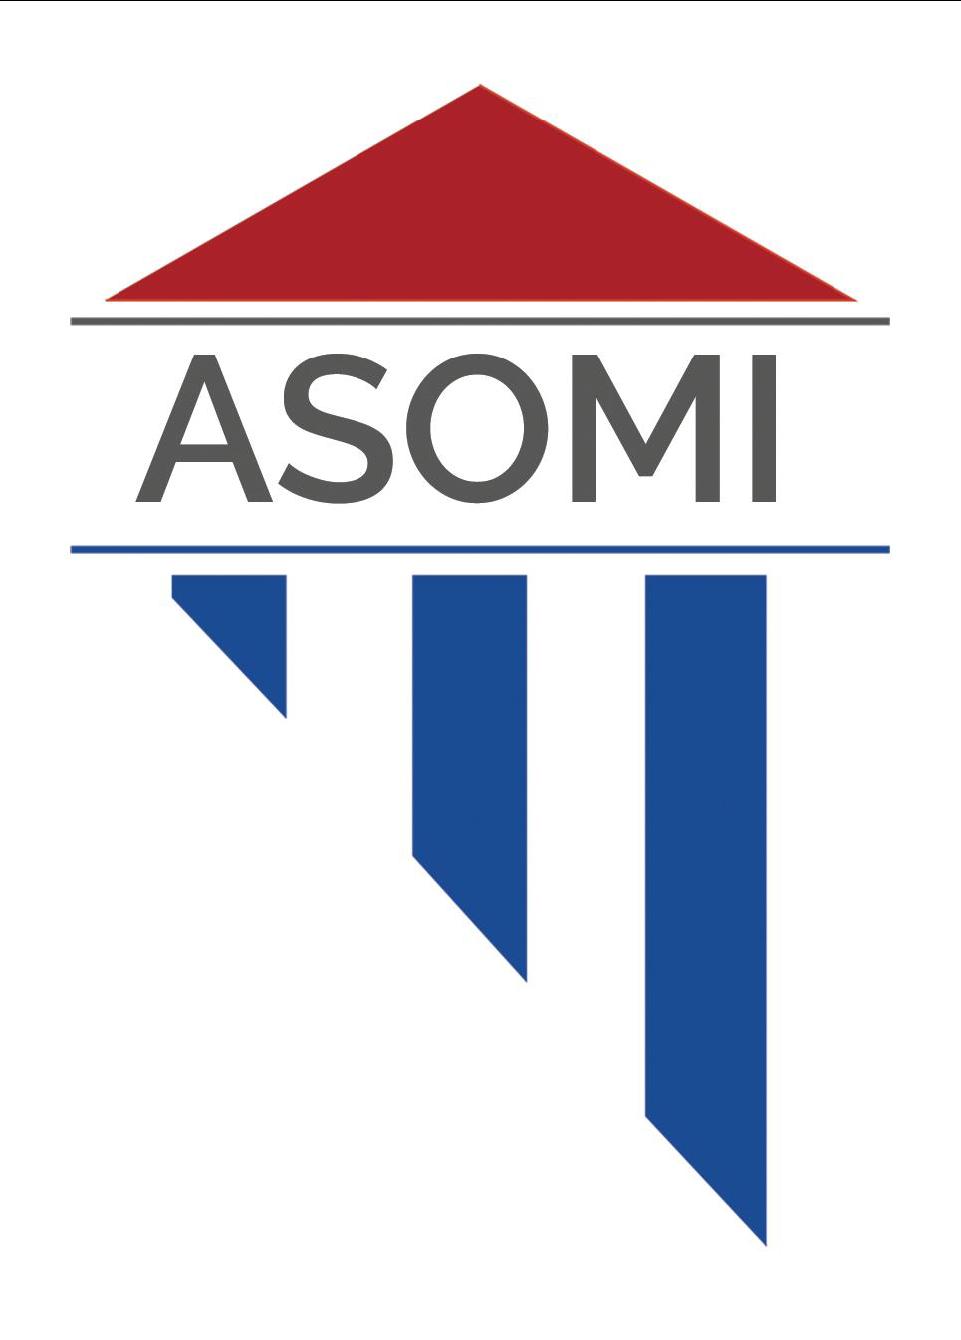 asomi image